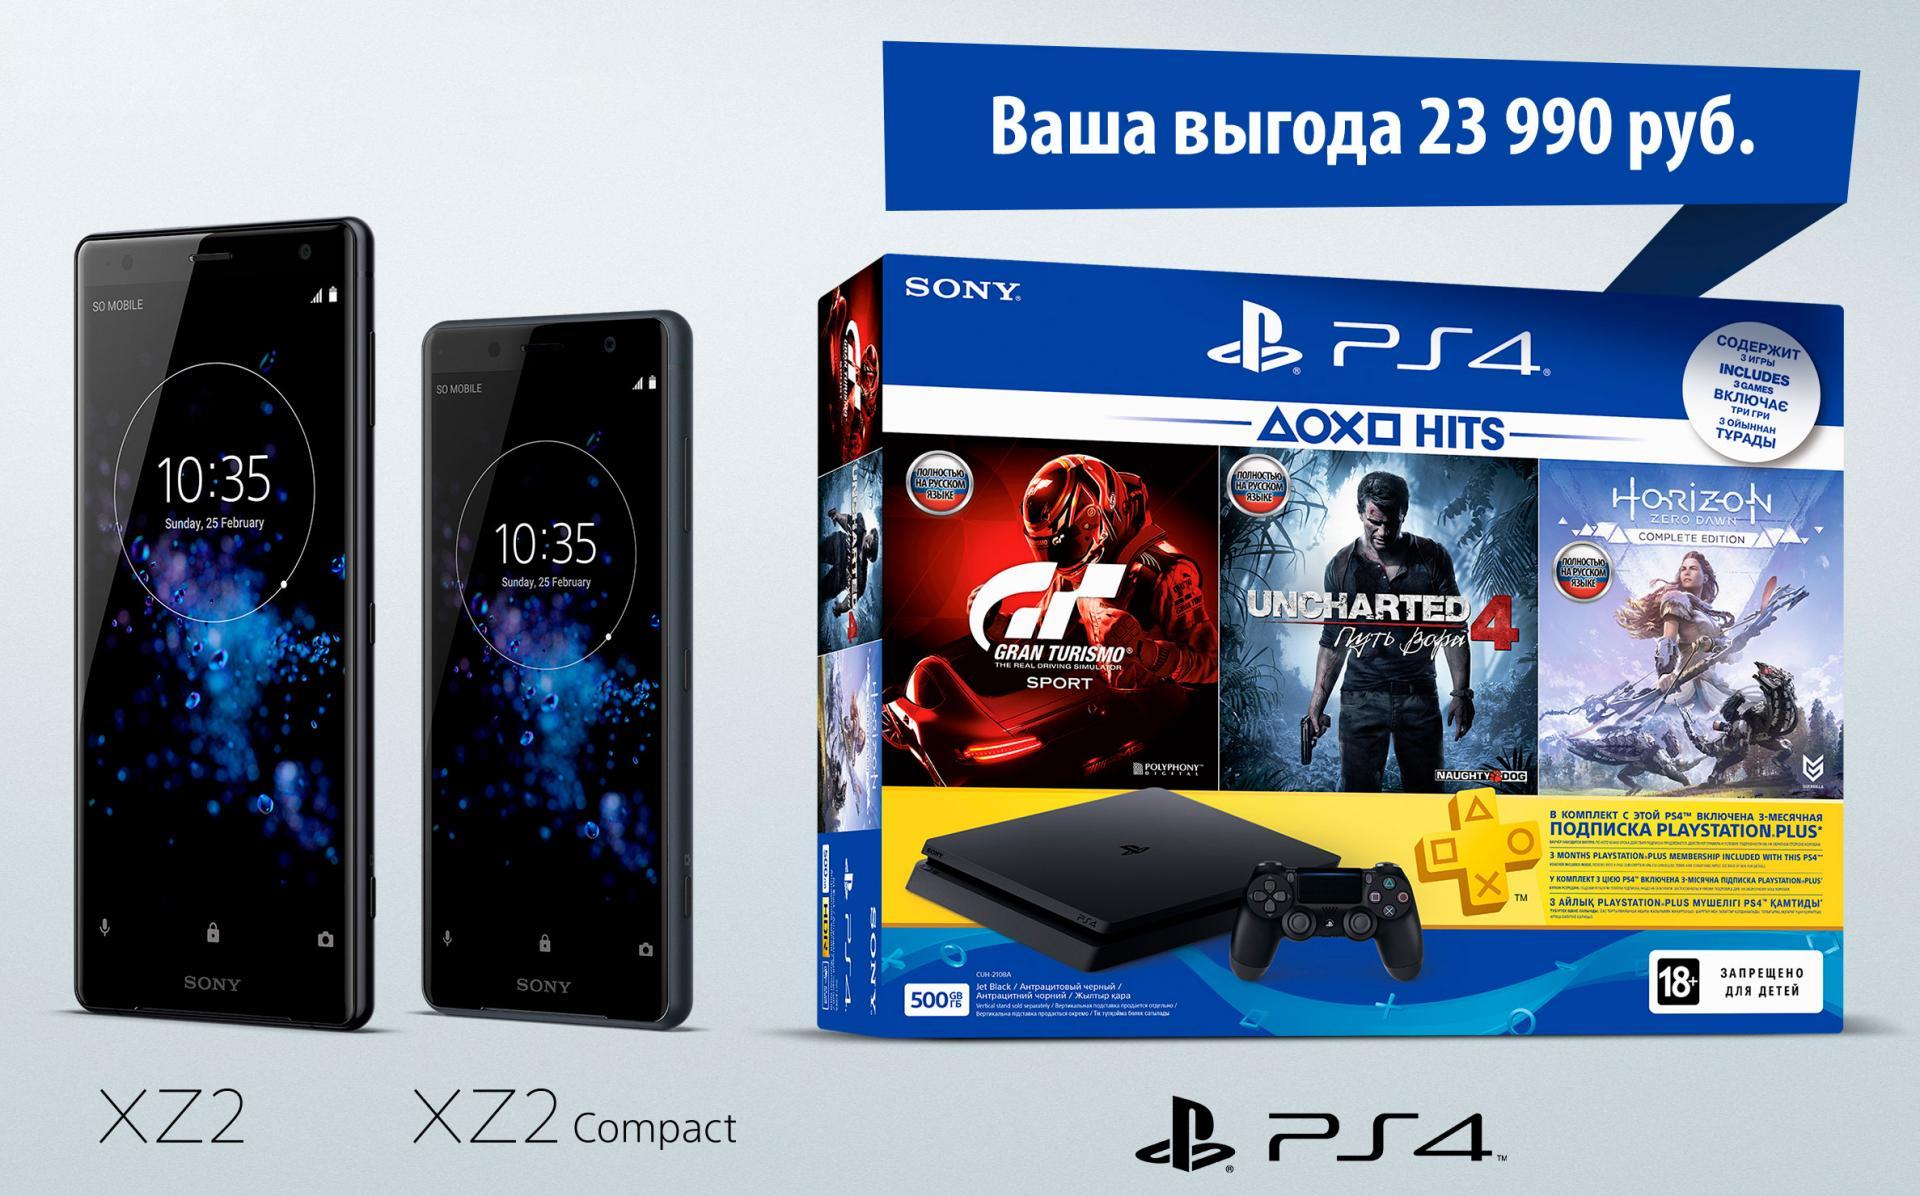 PlayStation 4 бесплатно! Только купи смартфон Xperia XZ2 или Xperia XZ2